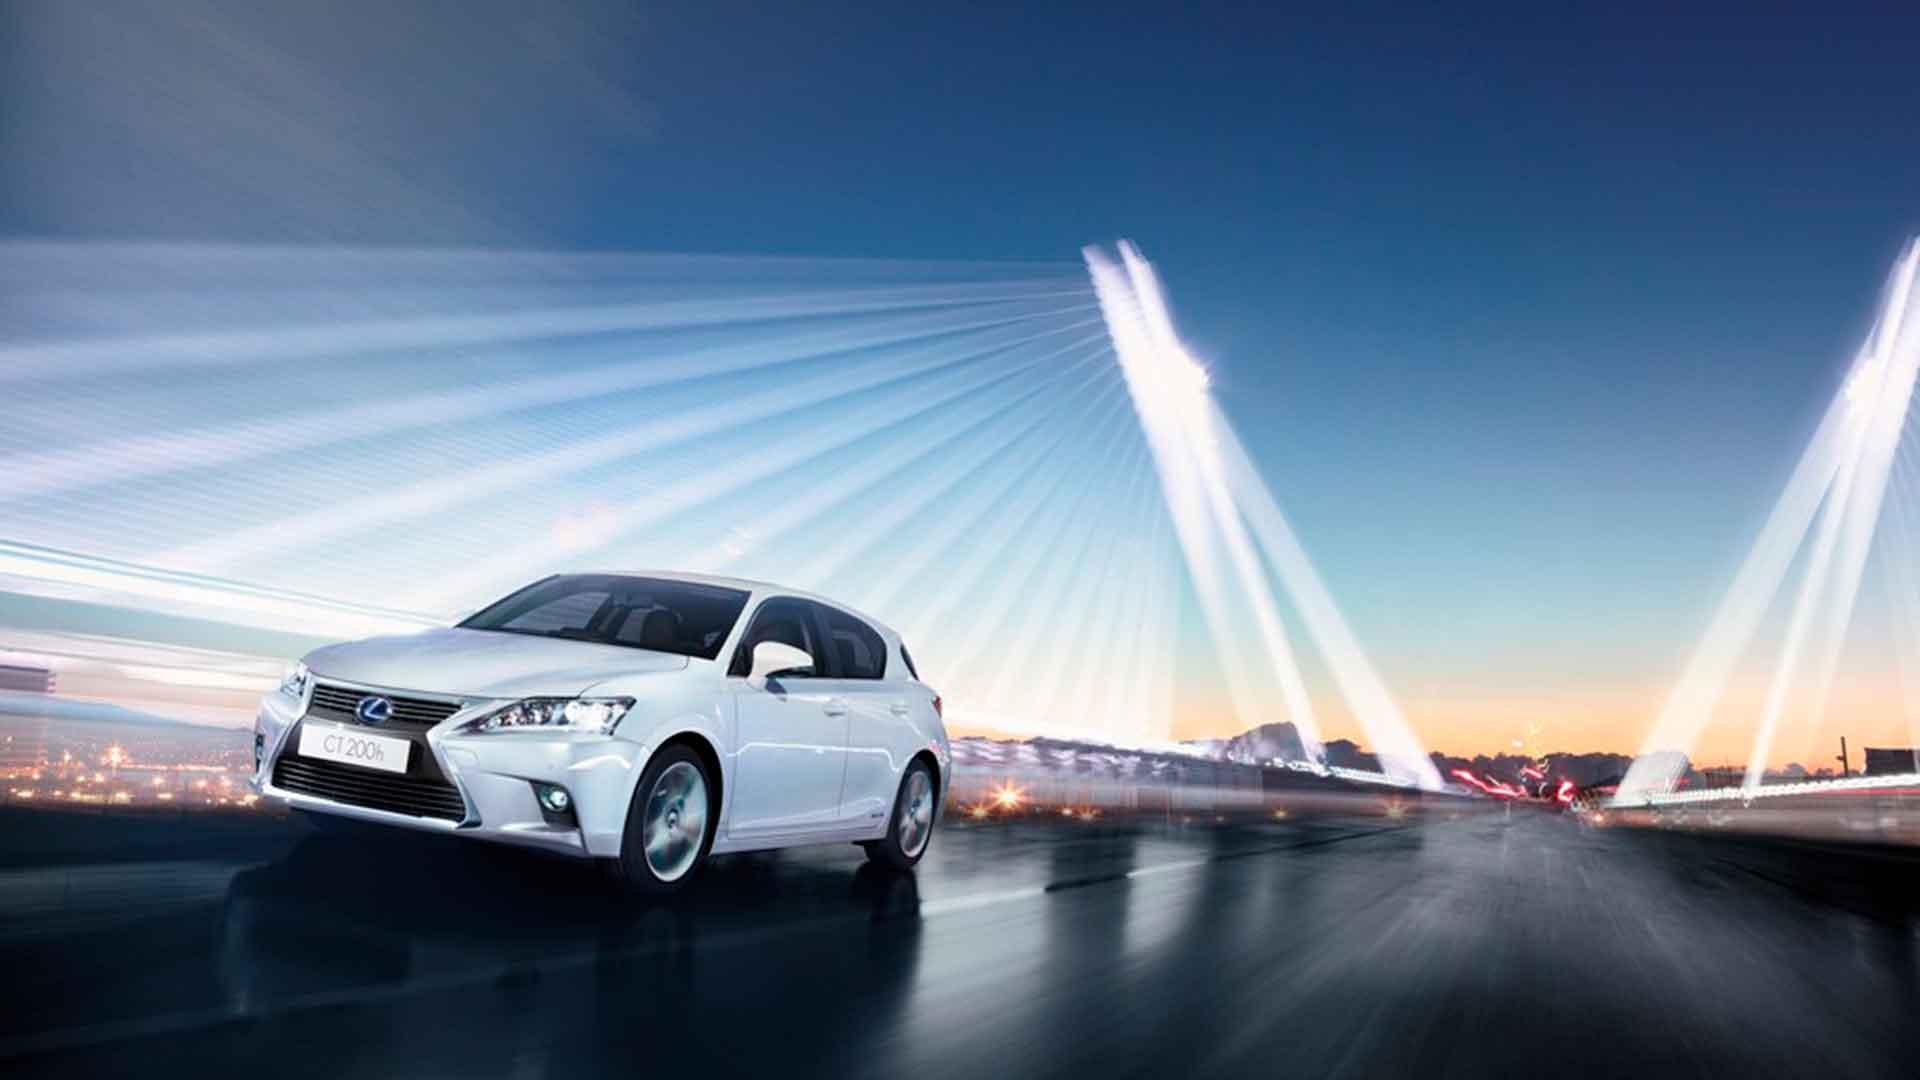 Lexus CT 200h su programa de accesorios hero asset